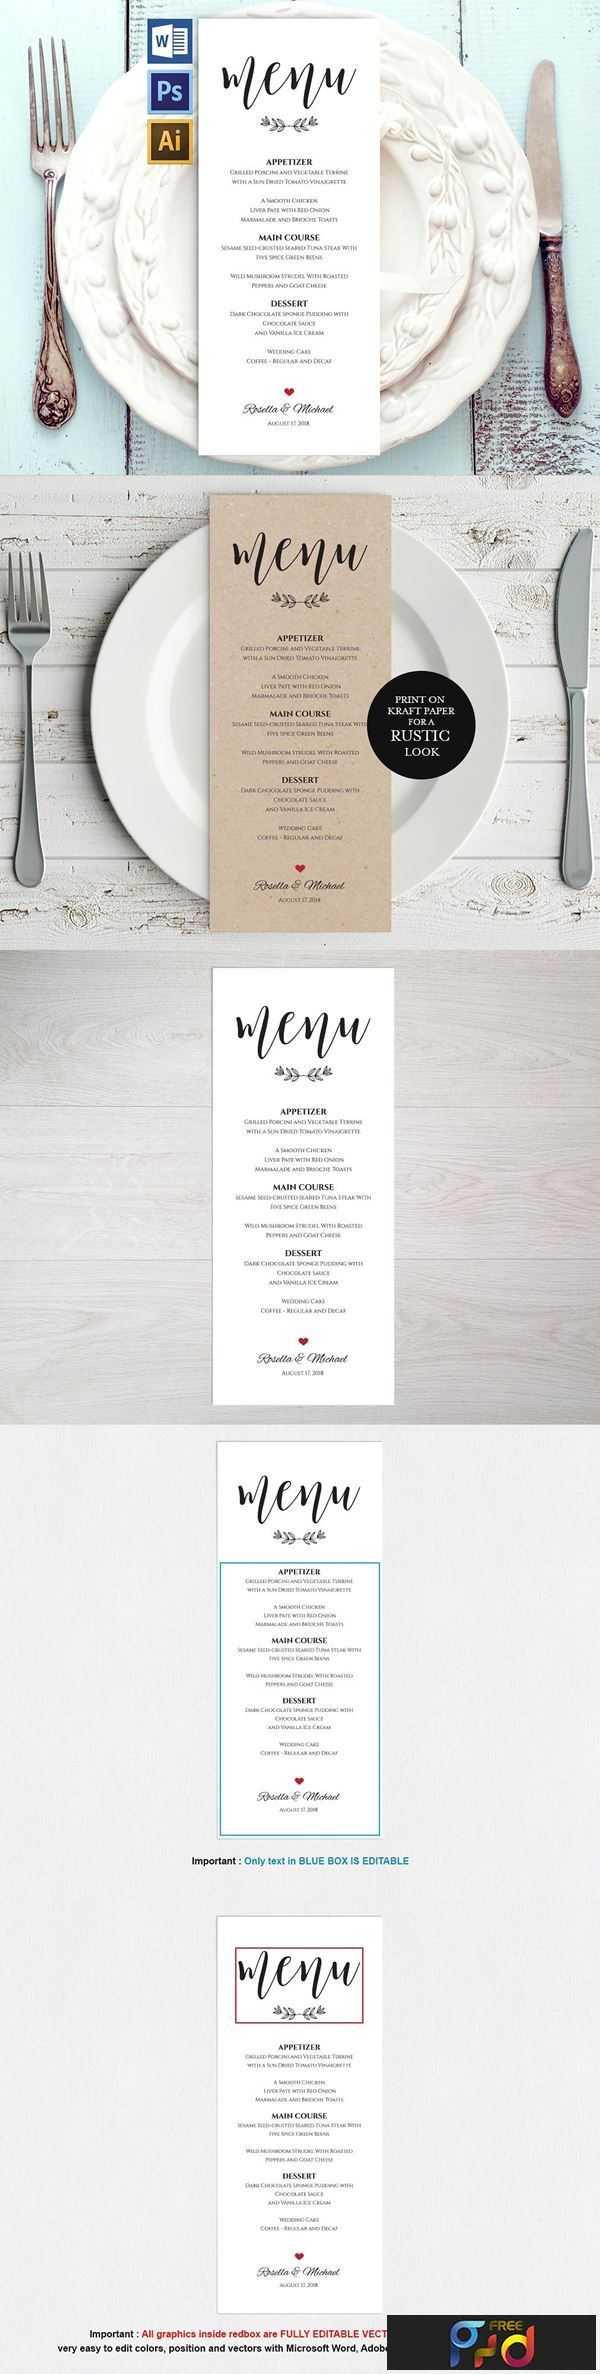 1806261 Wedding Menu Template Wpc 127 1550249 1